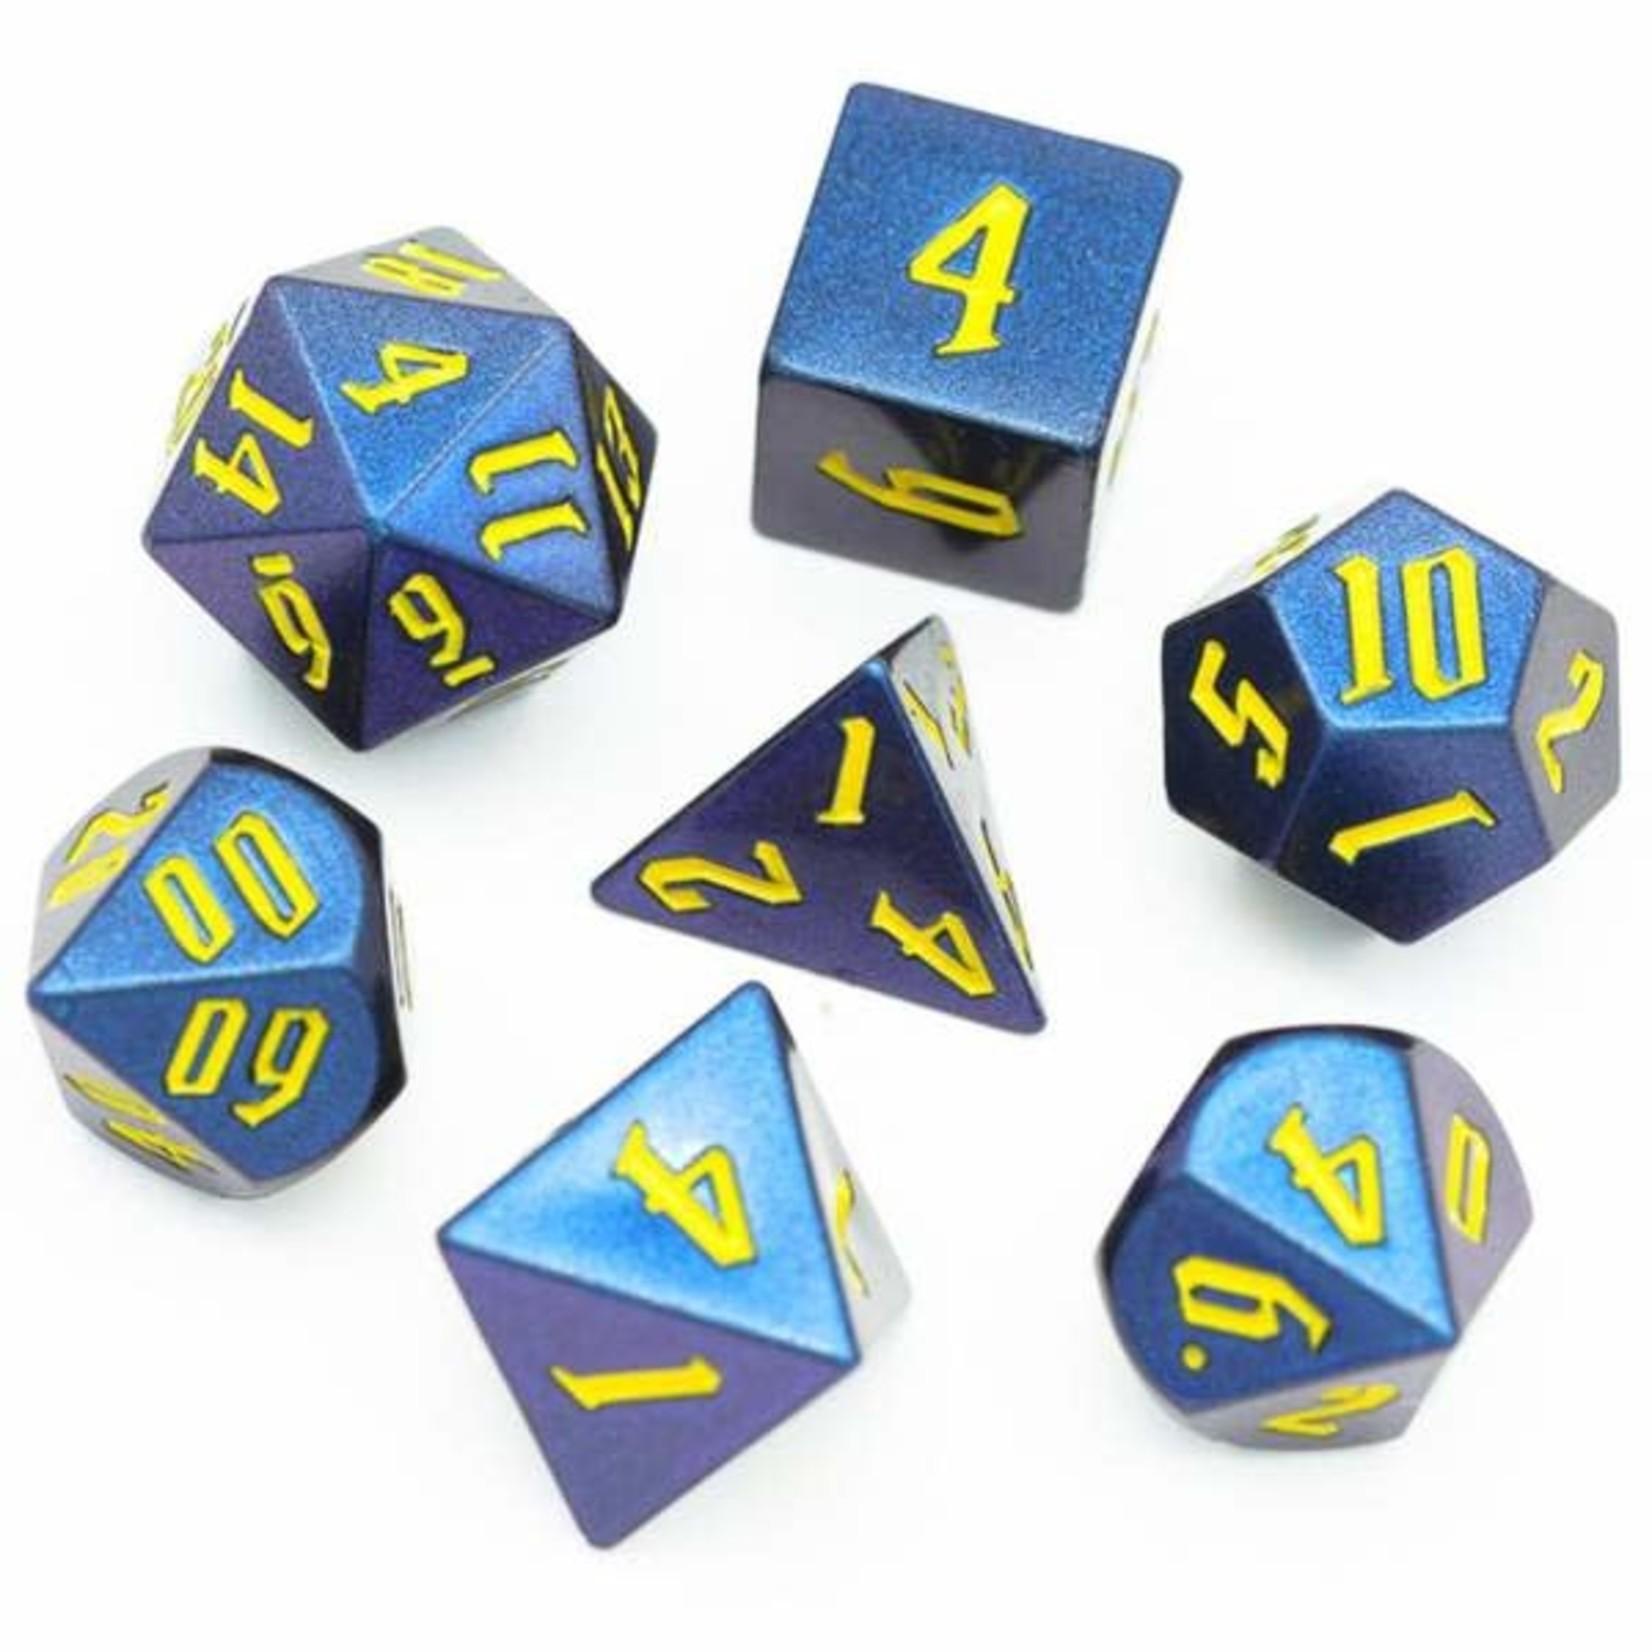 Foam Brain FB Jumbo Color Shifting RPG Dice Set - Purple/Blue